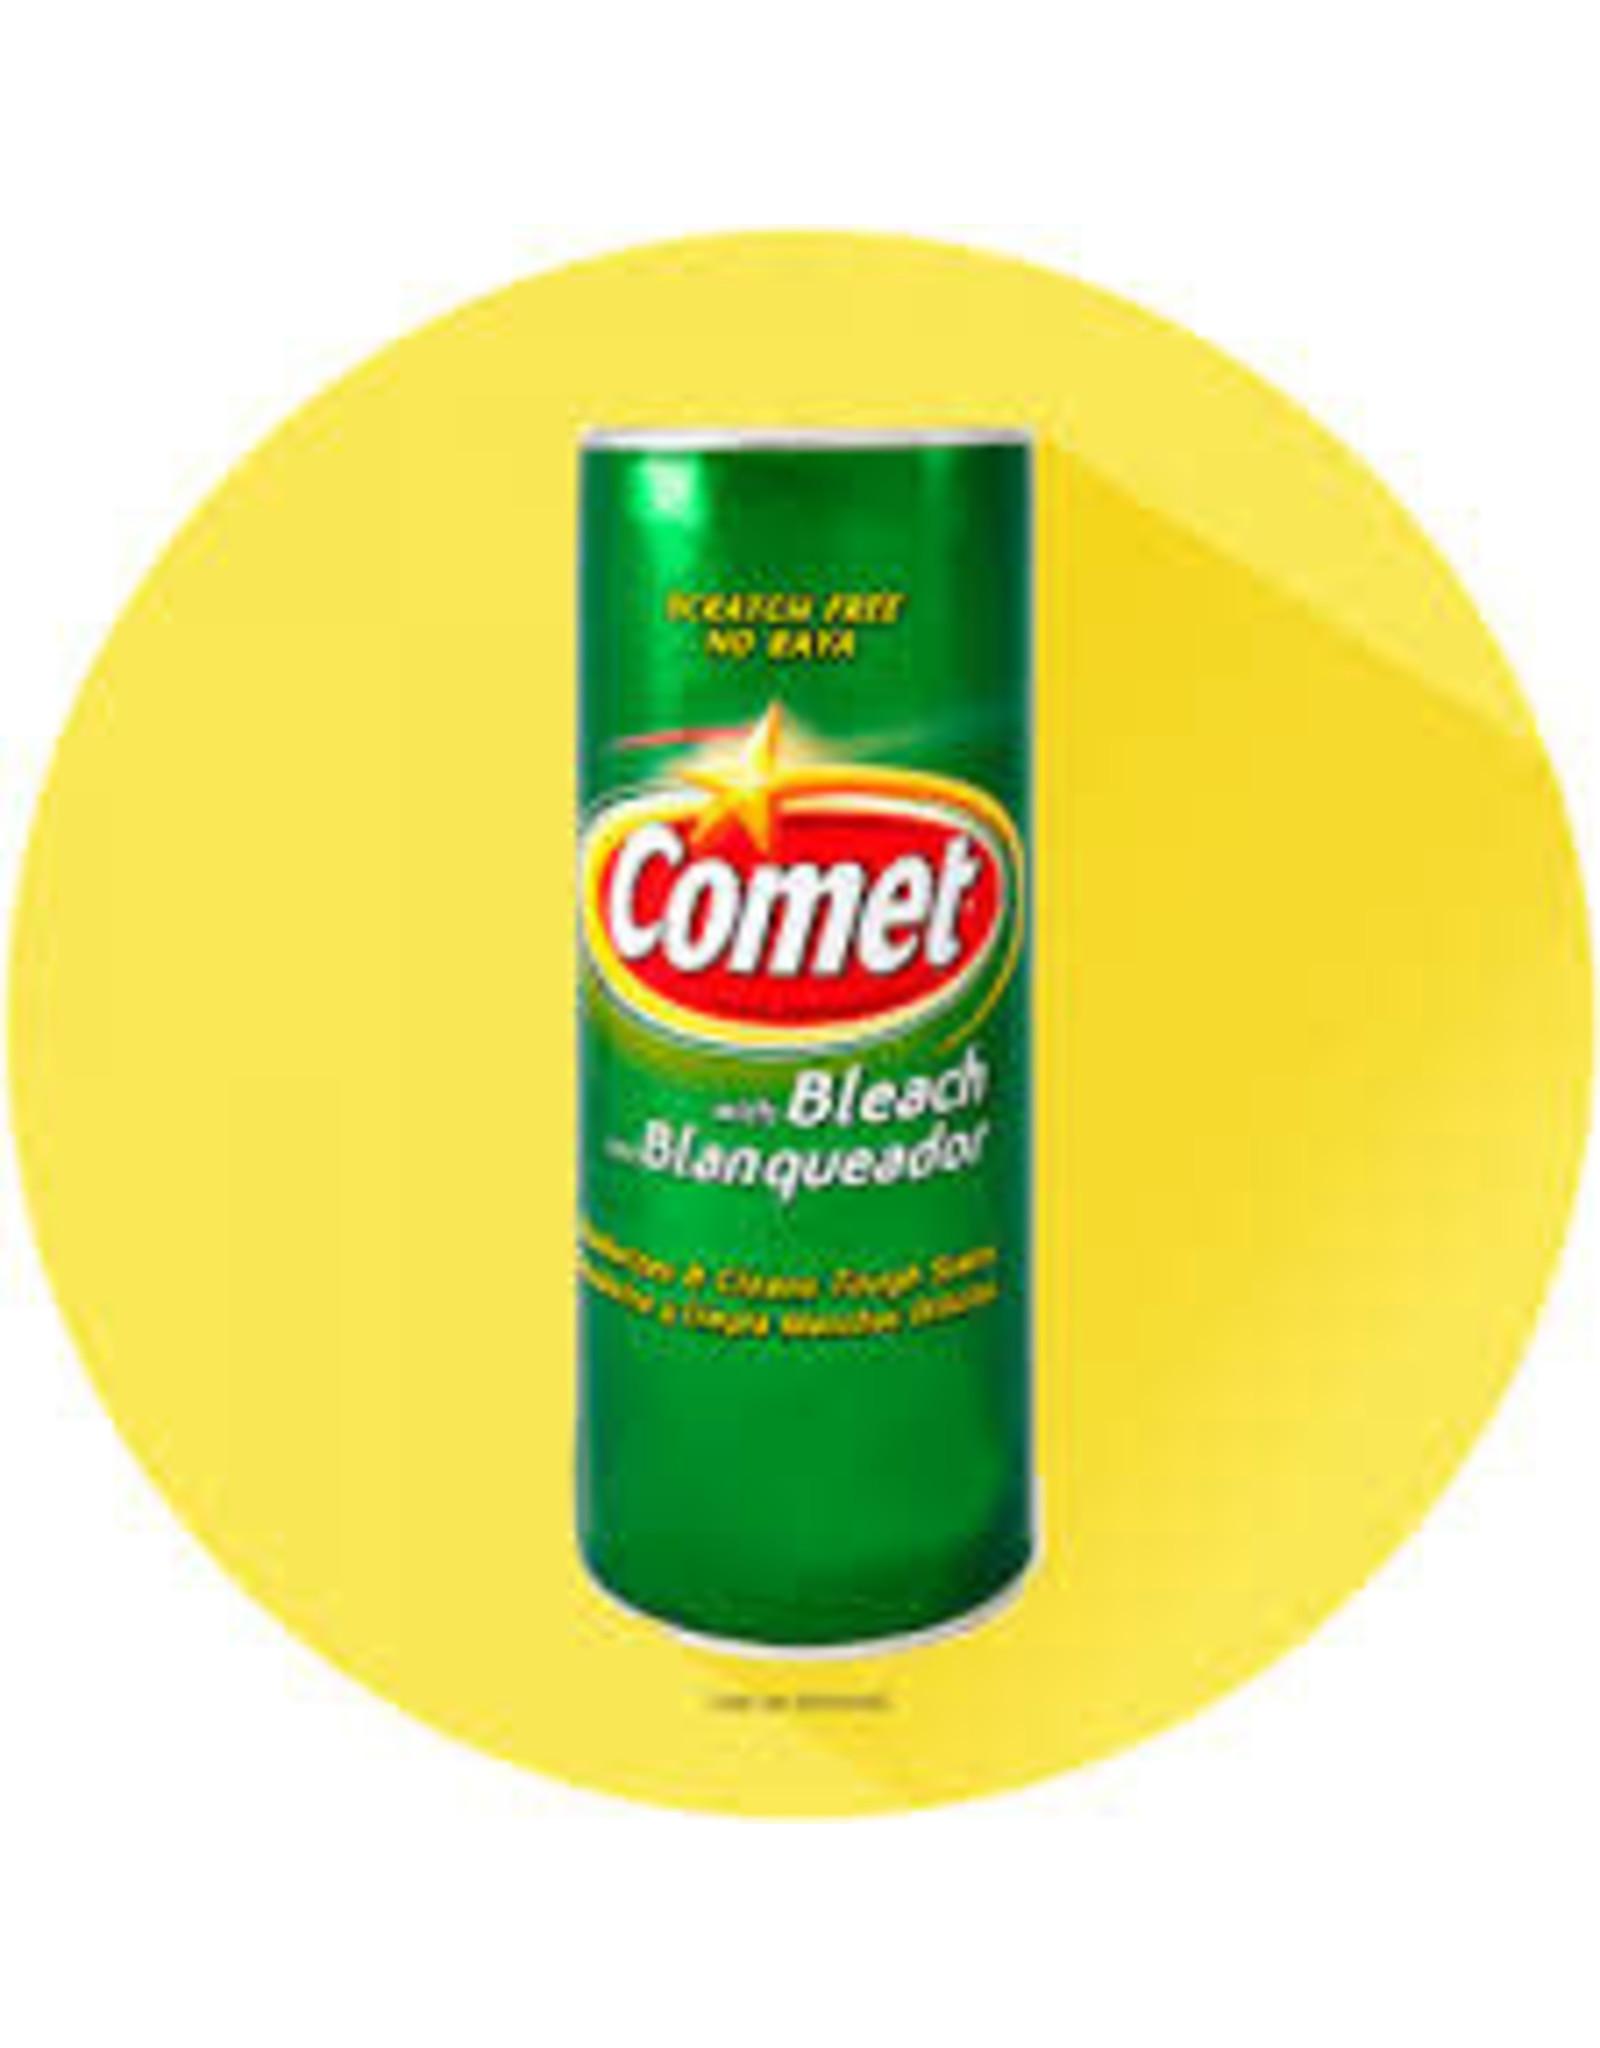 Comet bleach